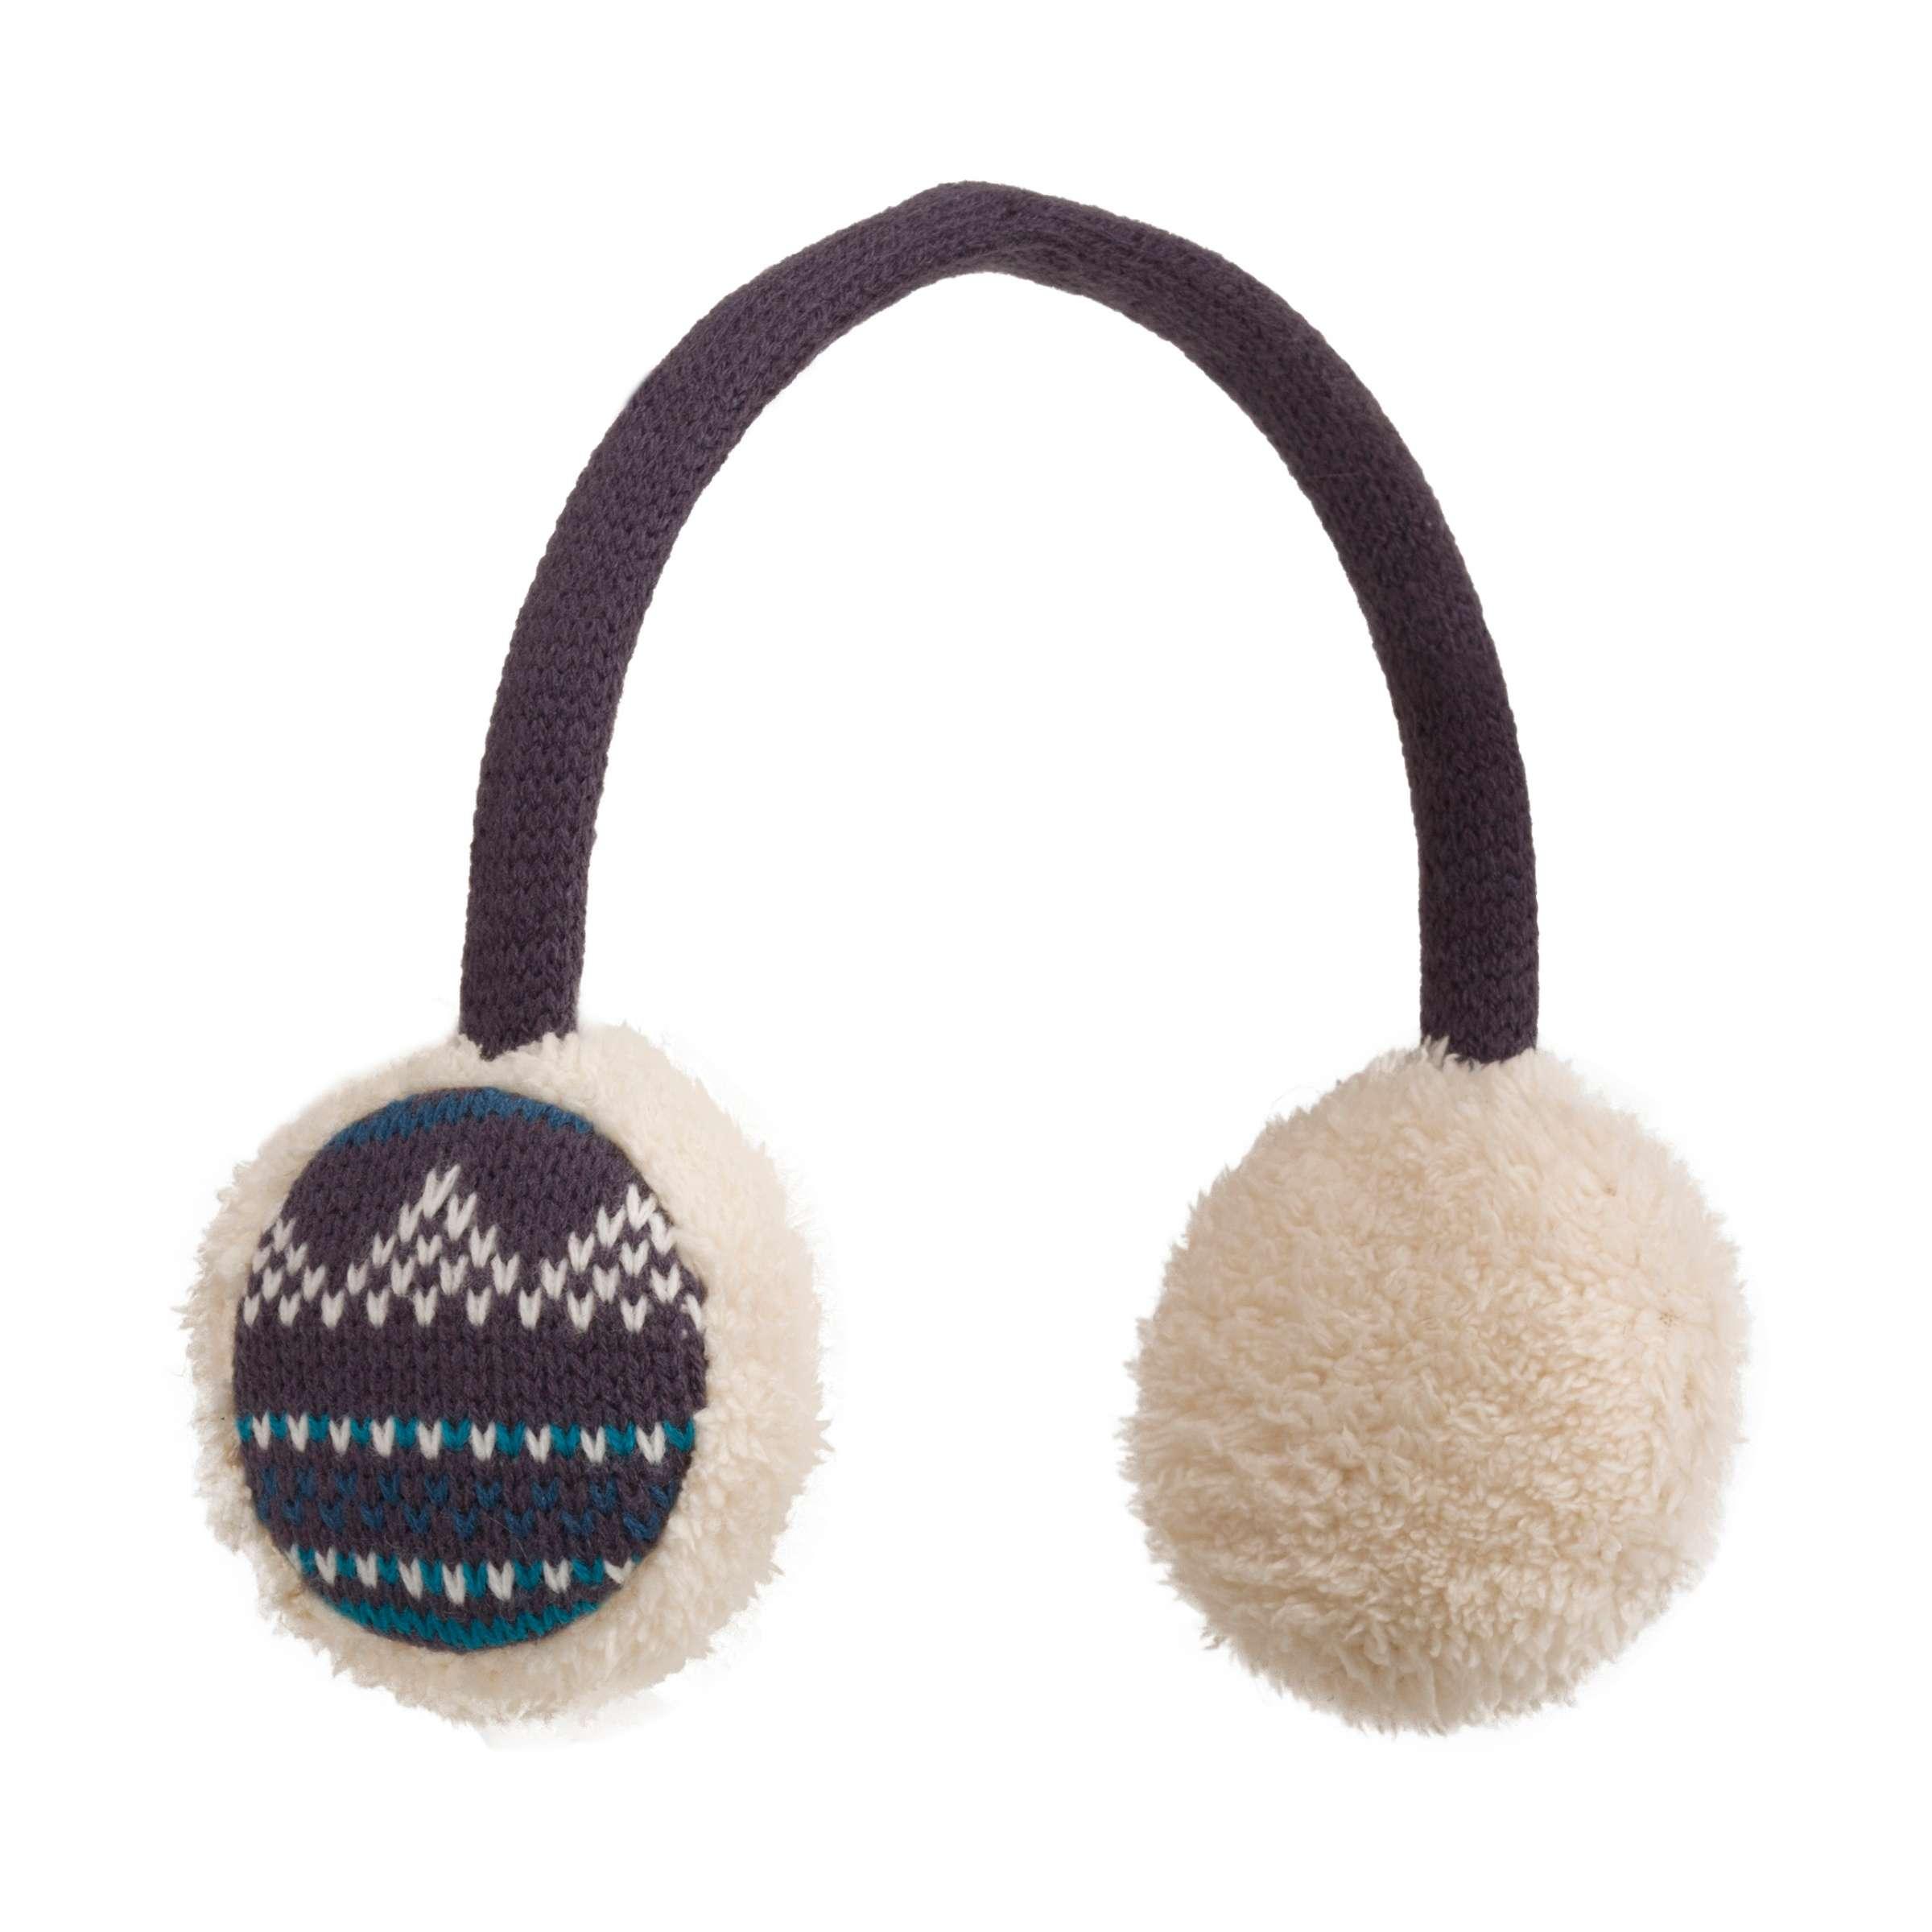 PETER STORM Women's Fairisle Earmuffs